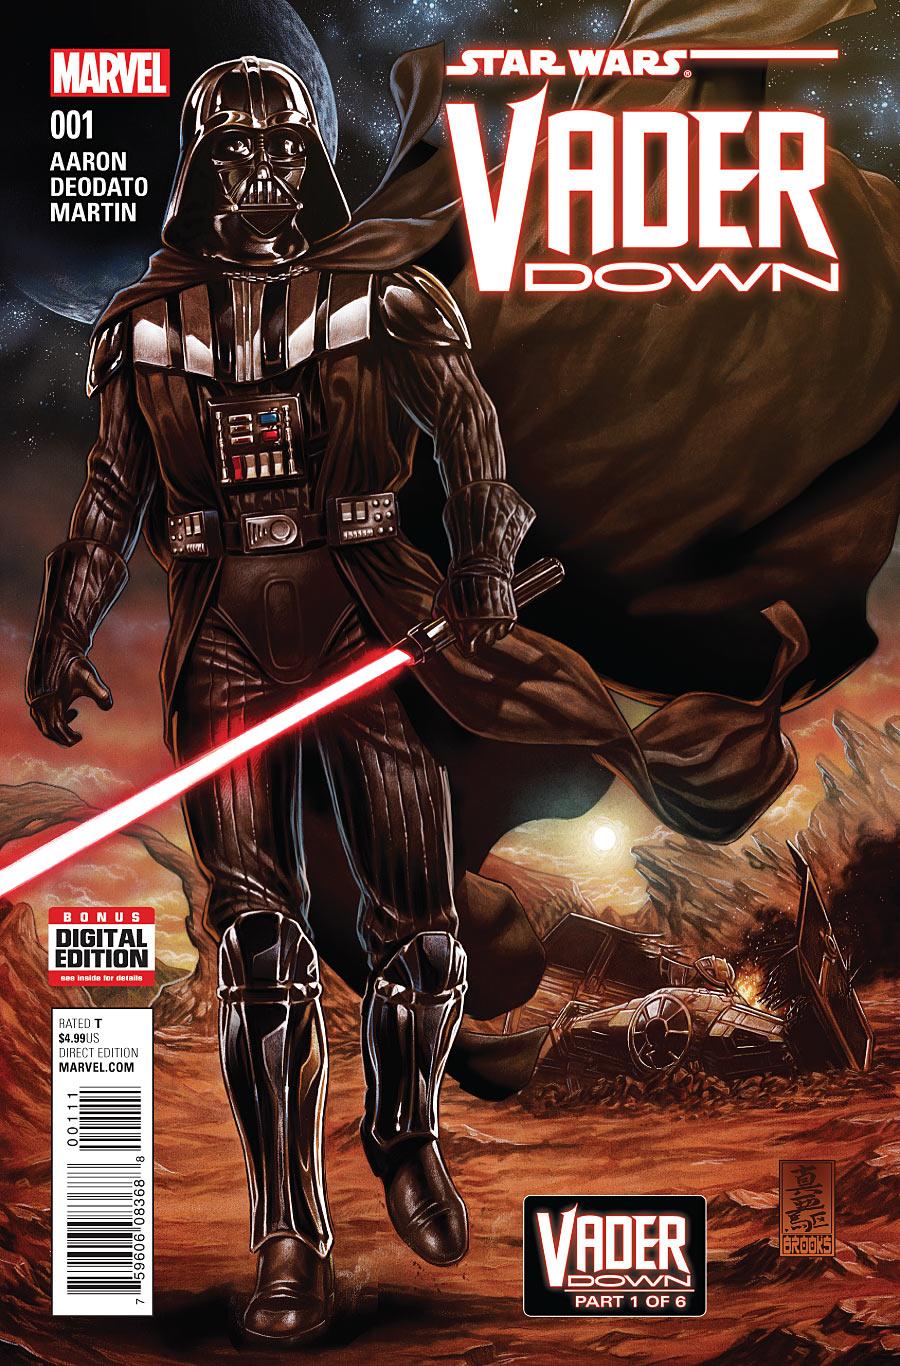 Star Wars: Vader Down Vol 1 1